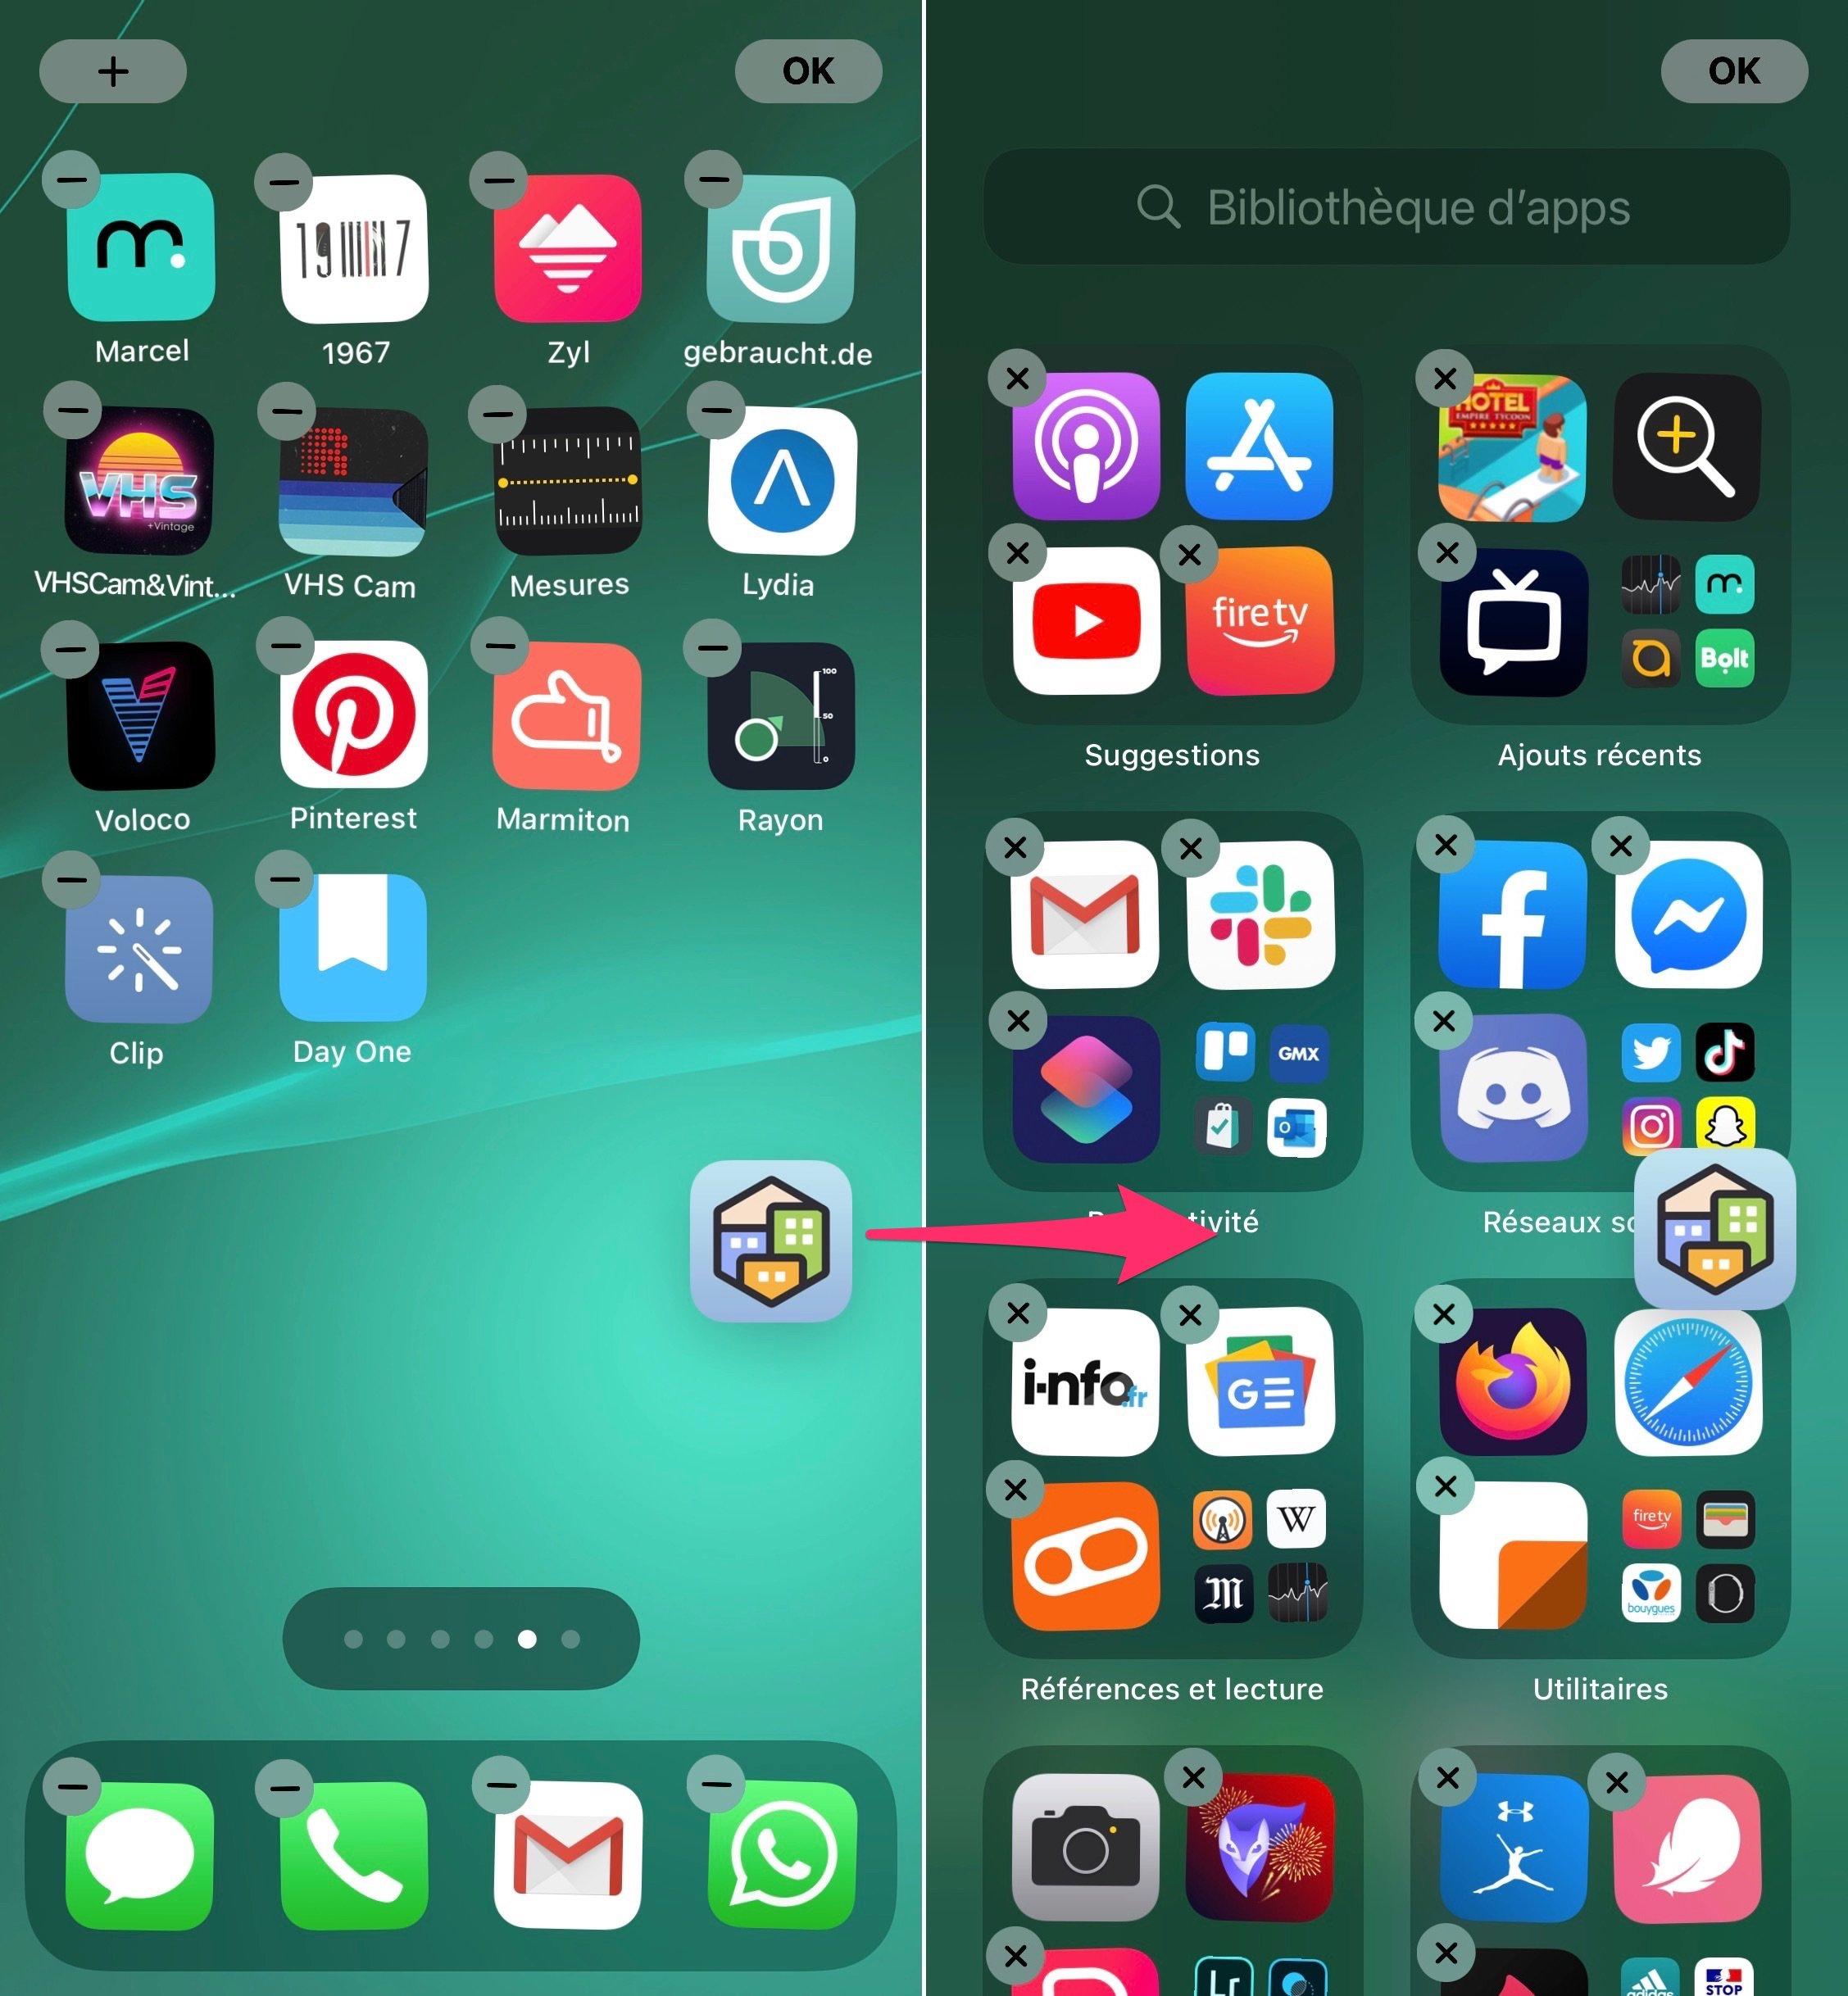 Glisser app bibliothèque d'apps